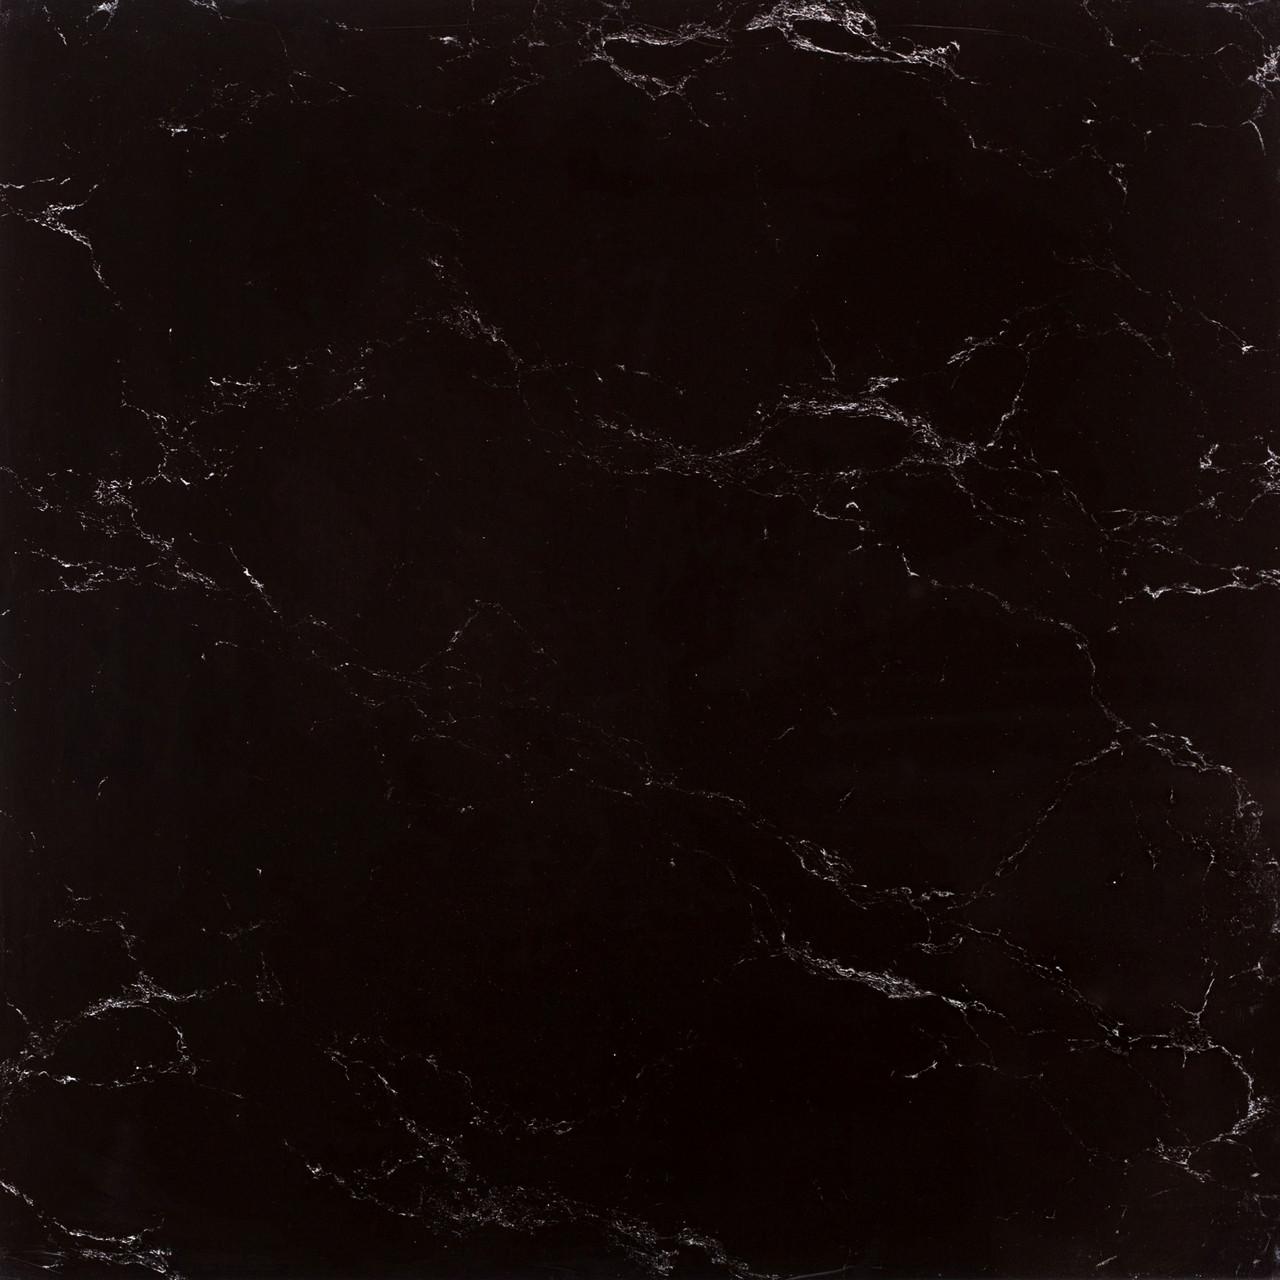 Керамогранит мрамор чёрный 60х60